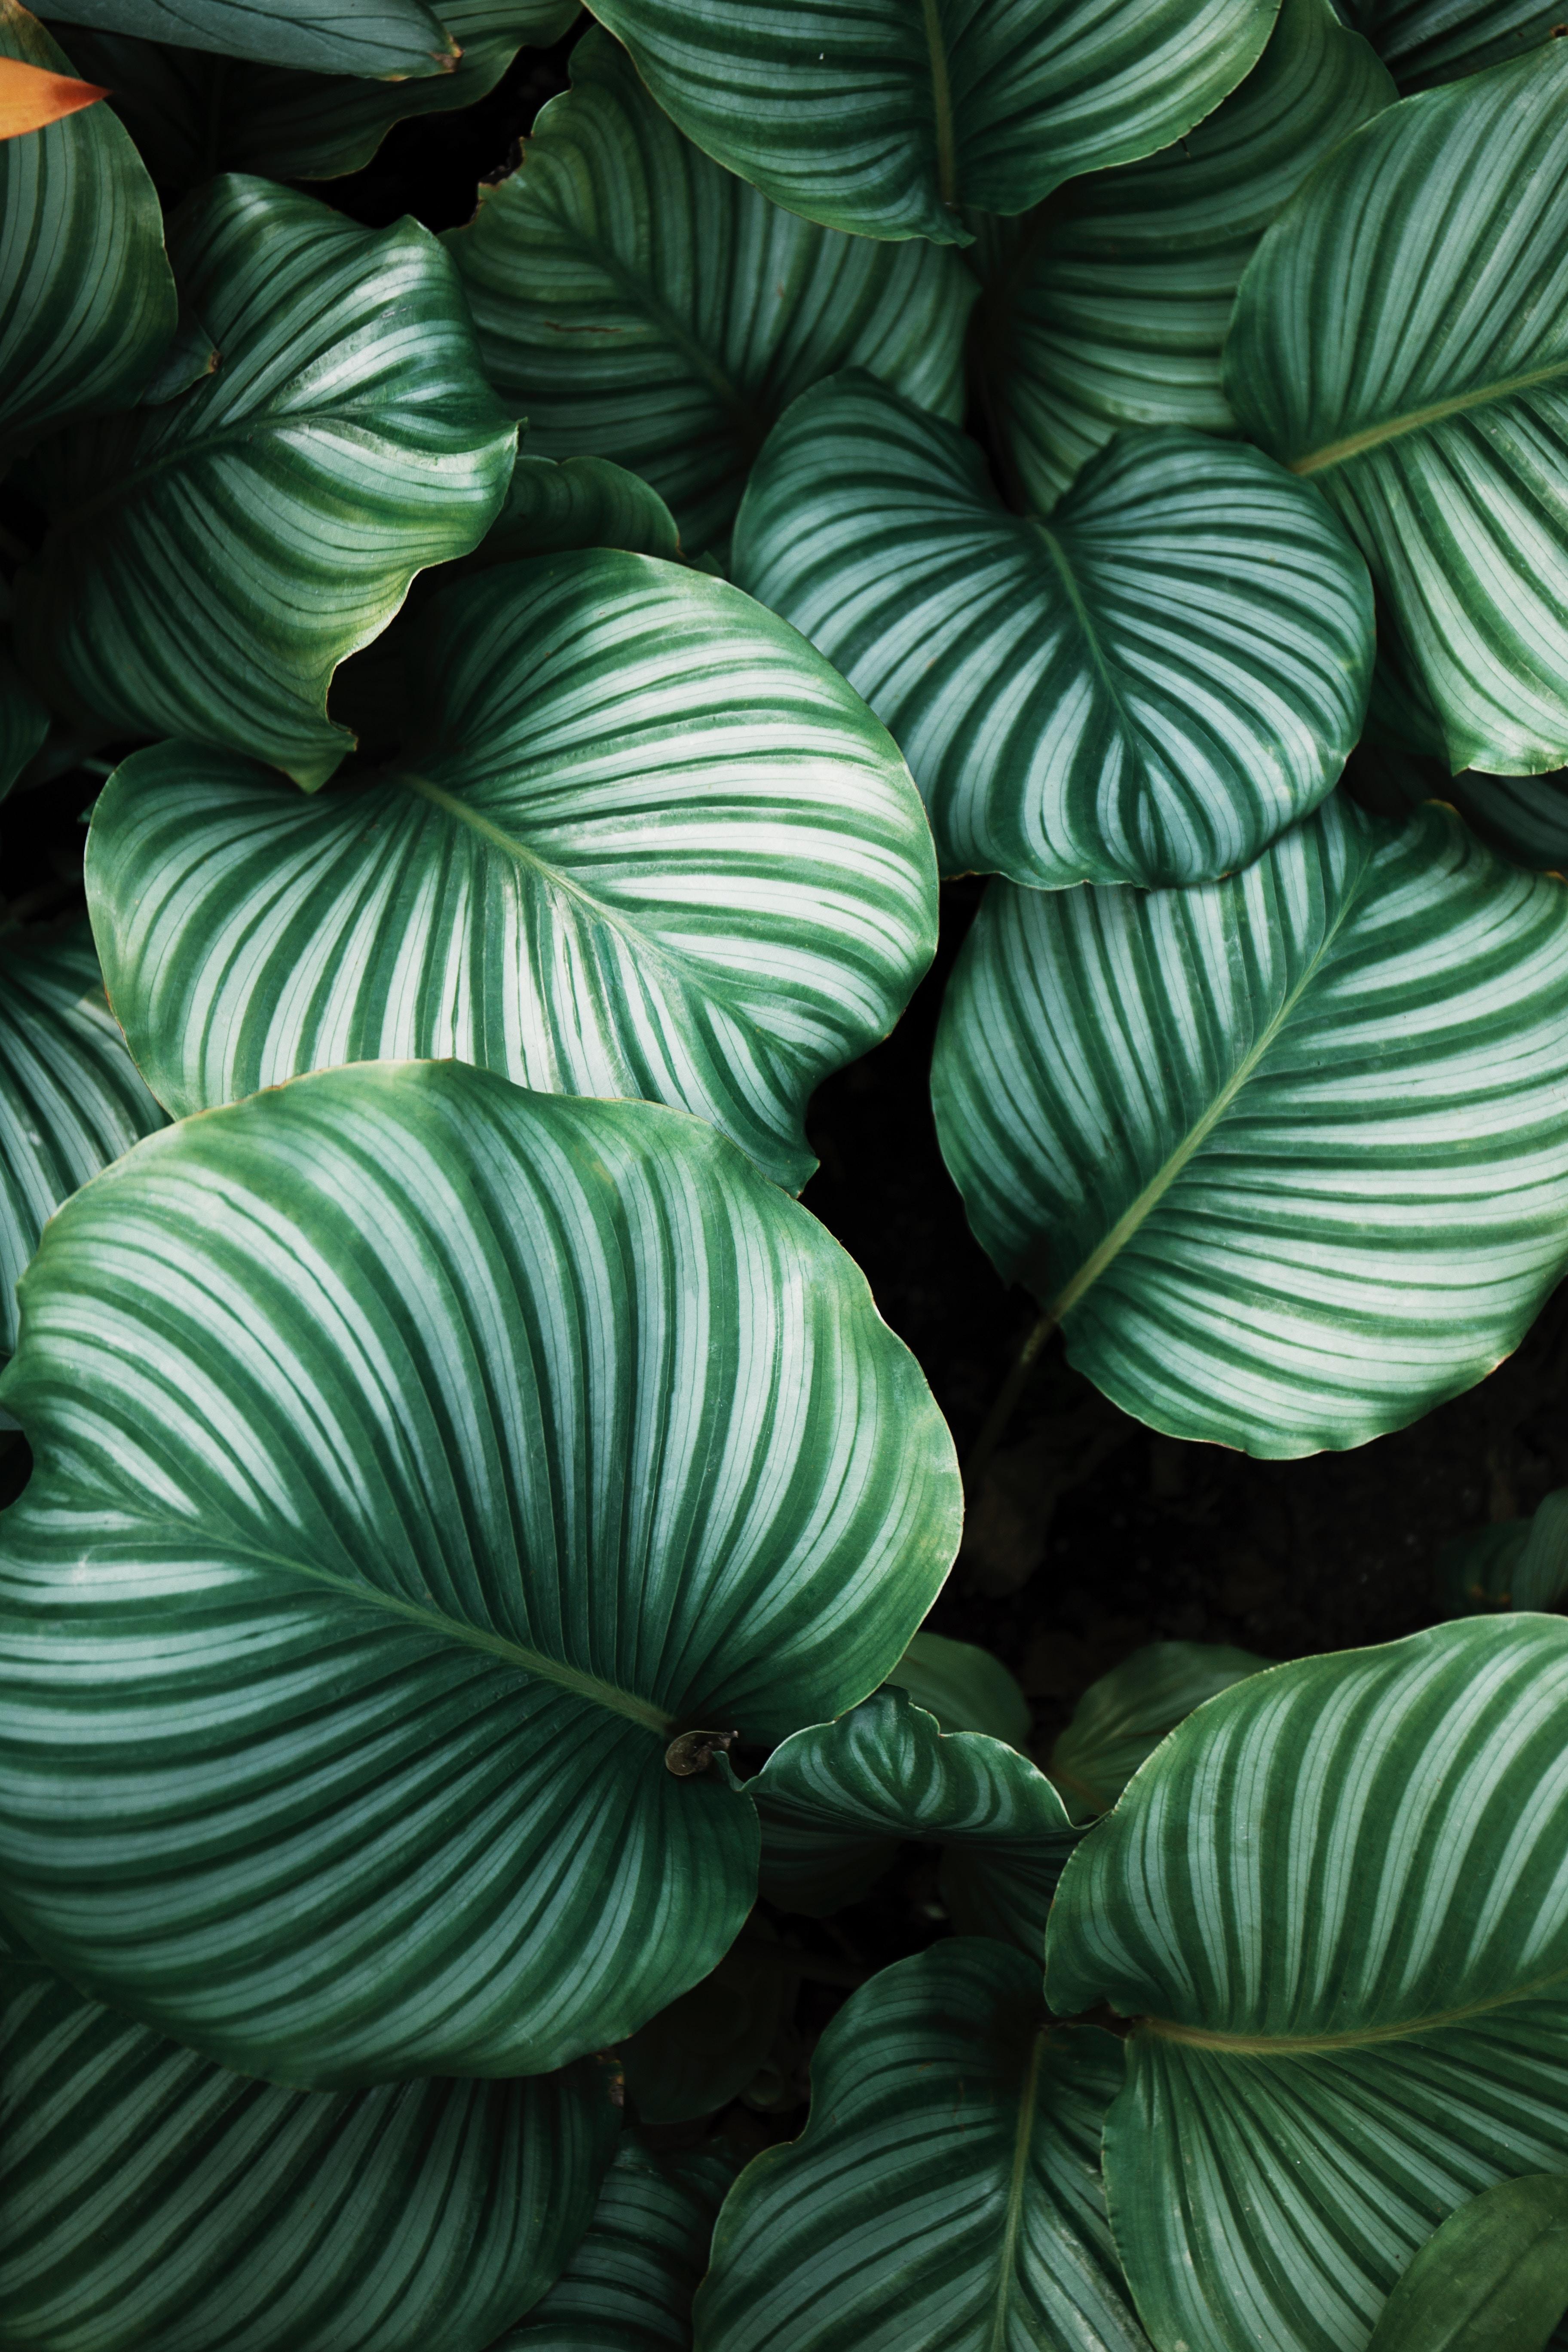 Green monstera leaves used as header image.